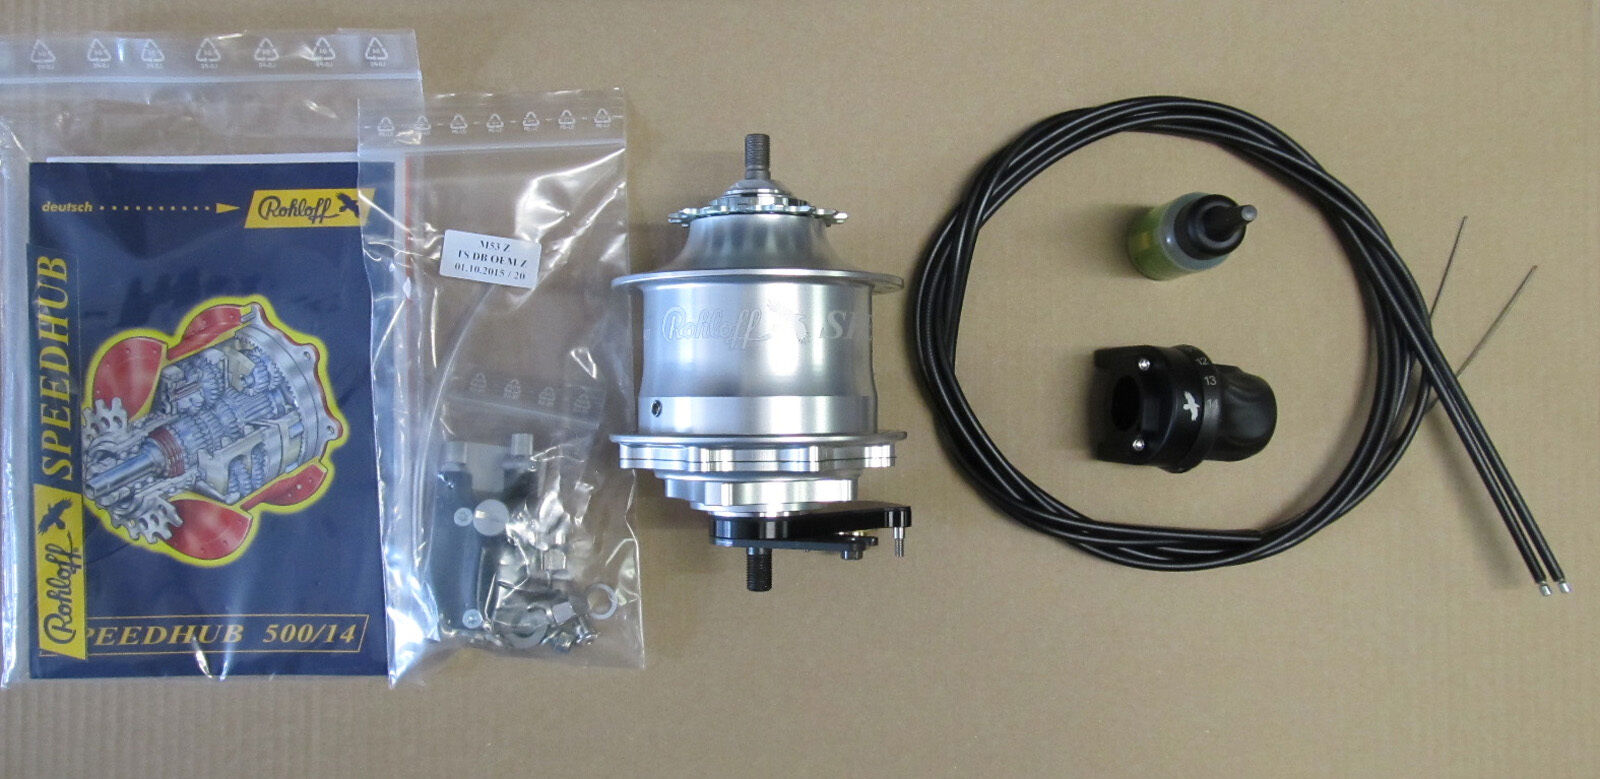 Rohloff Speedhub 500 14 TS DB OEM2 8065Z 8066Z 8067Z 14-Speed Internal Gear Hub